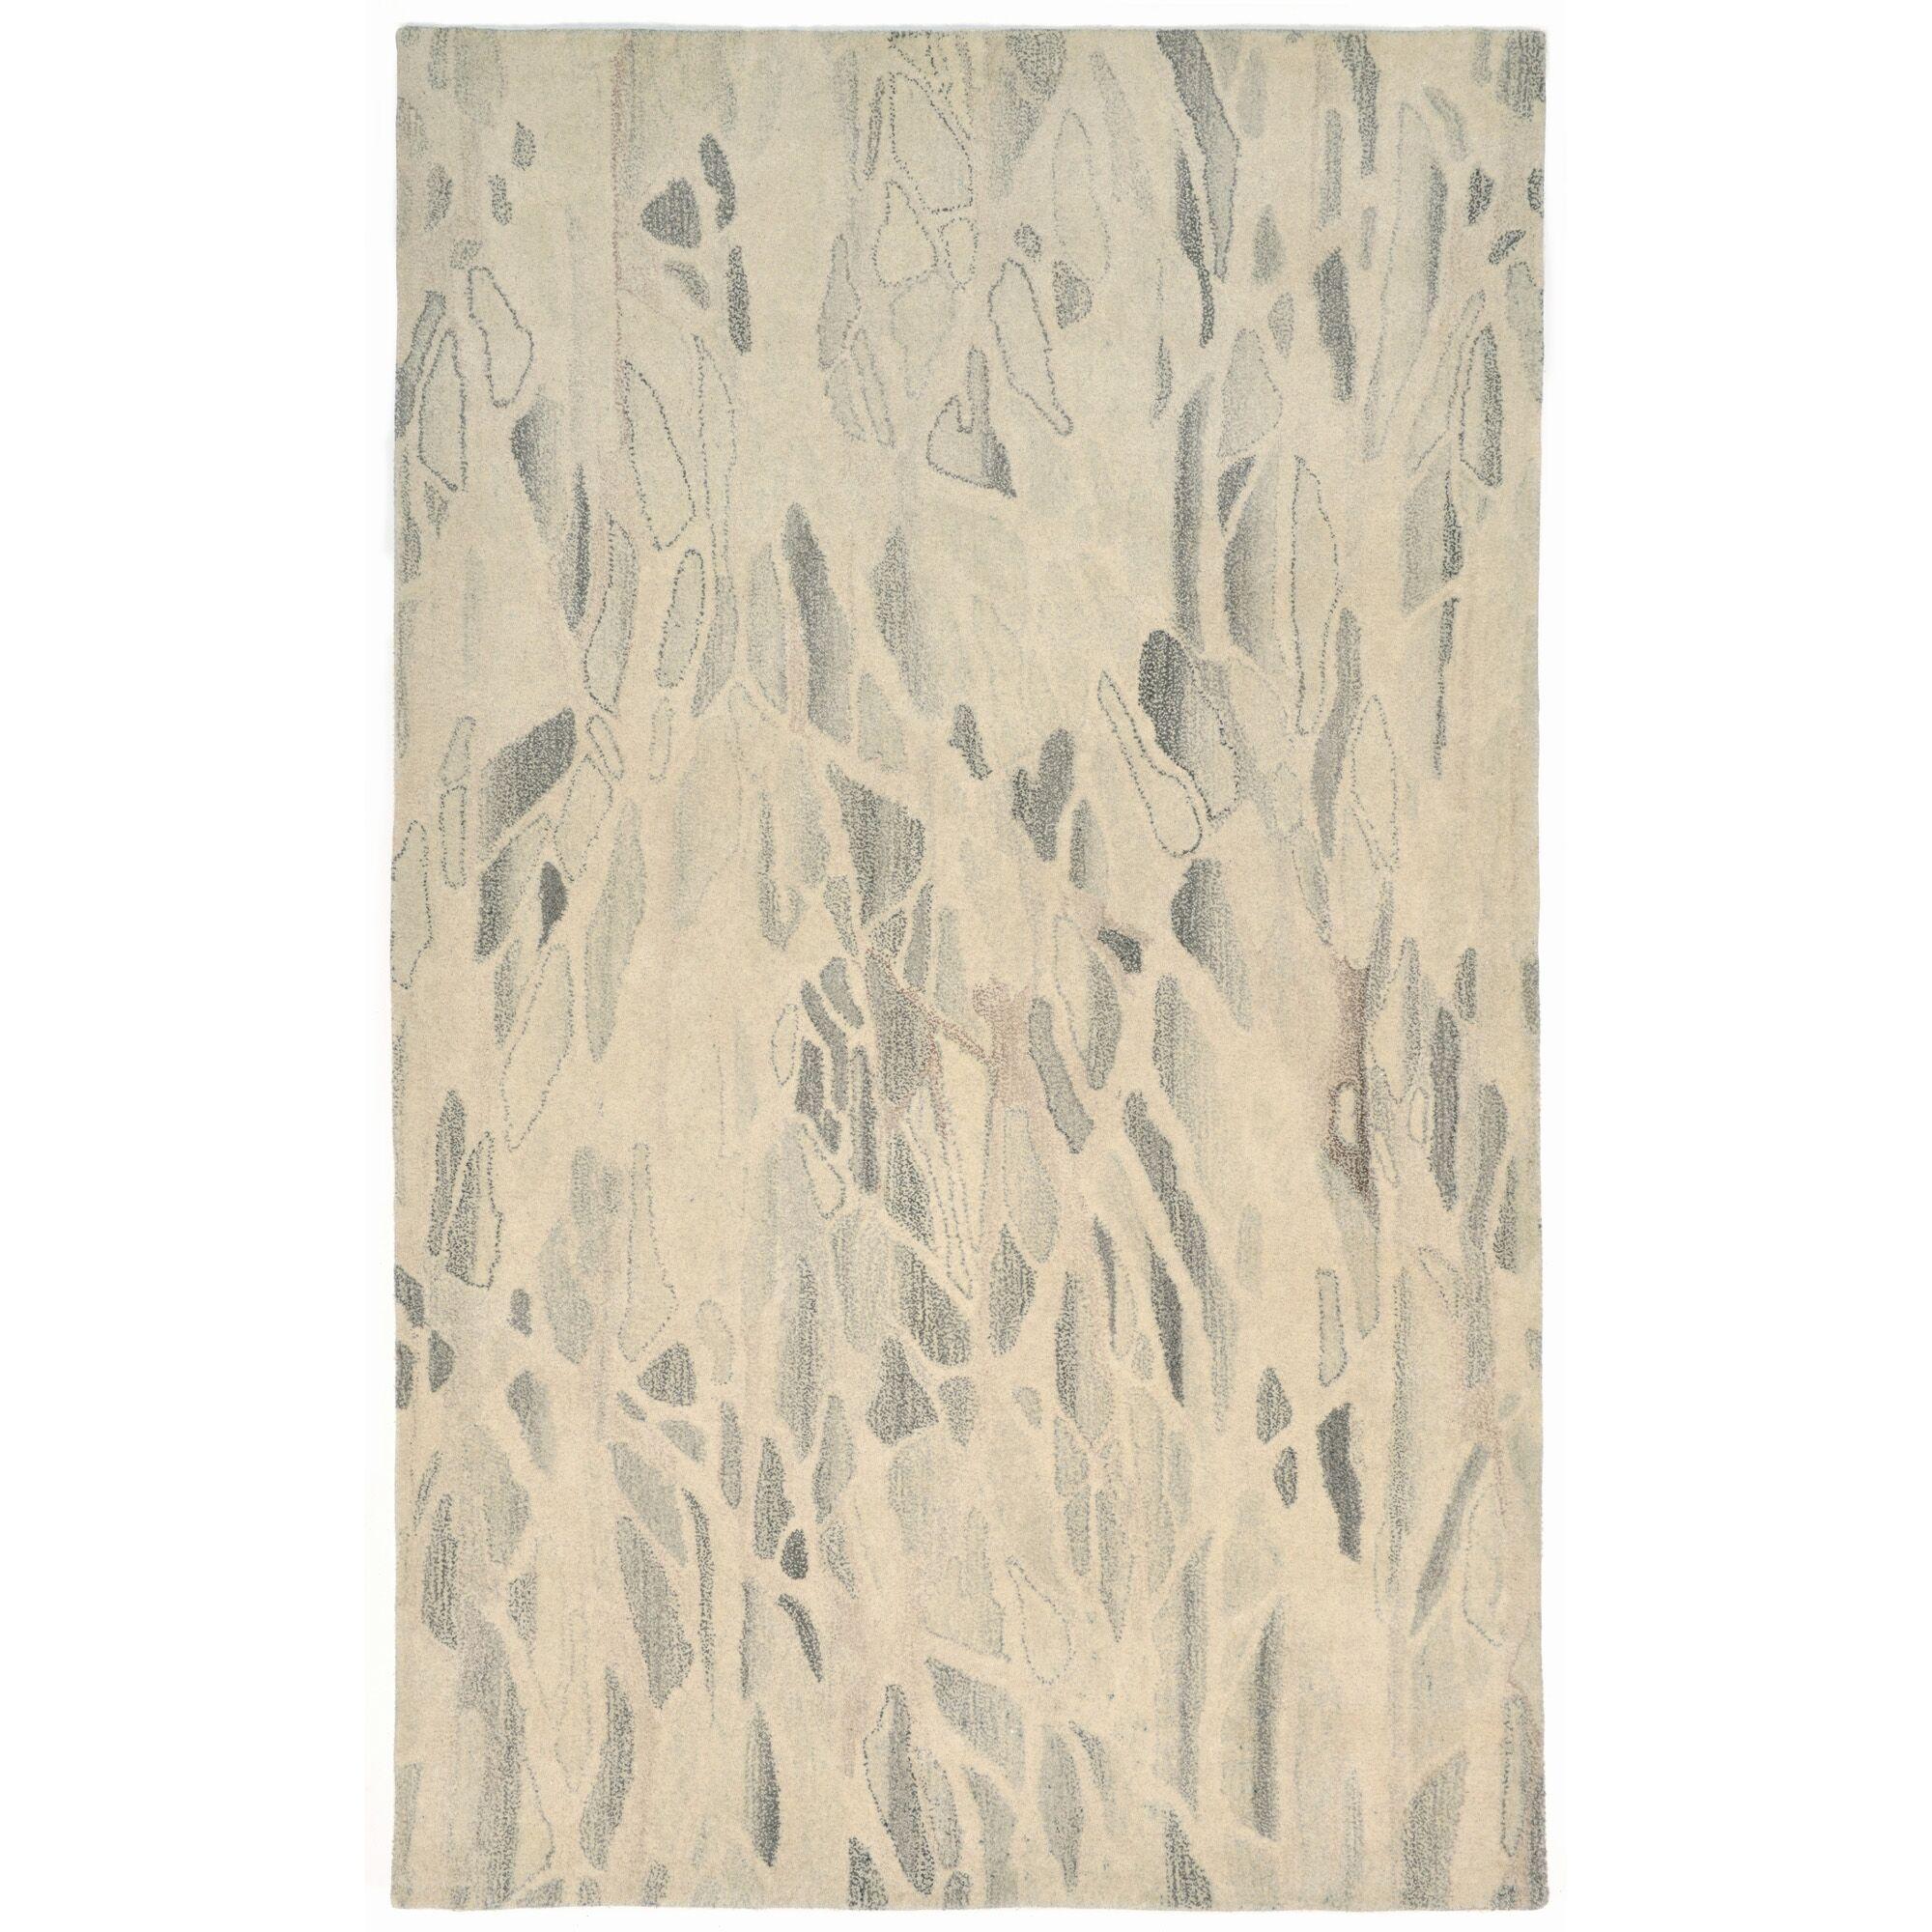 Buckleys Hand-Tufted Gray Area Rug Rug Size: 5' x 8'